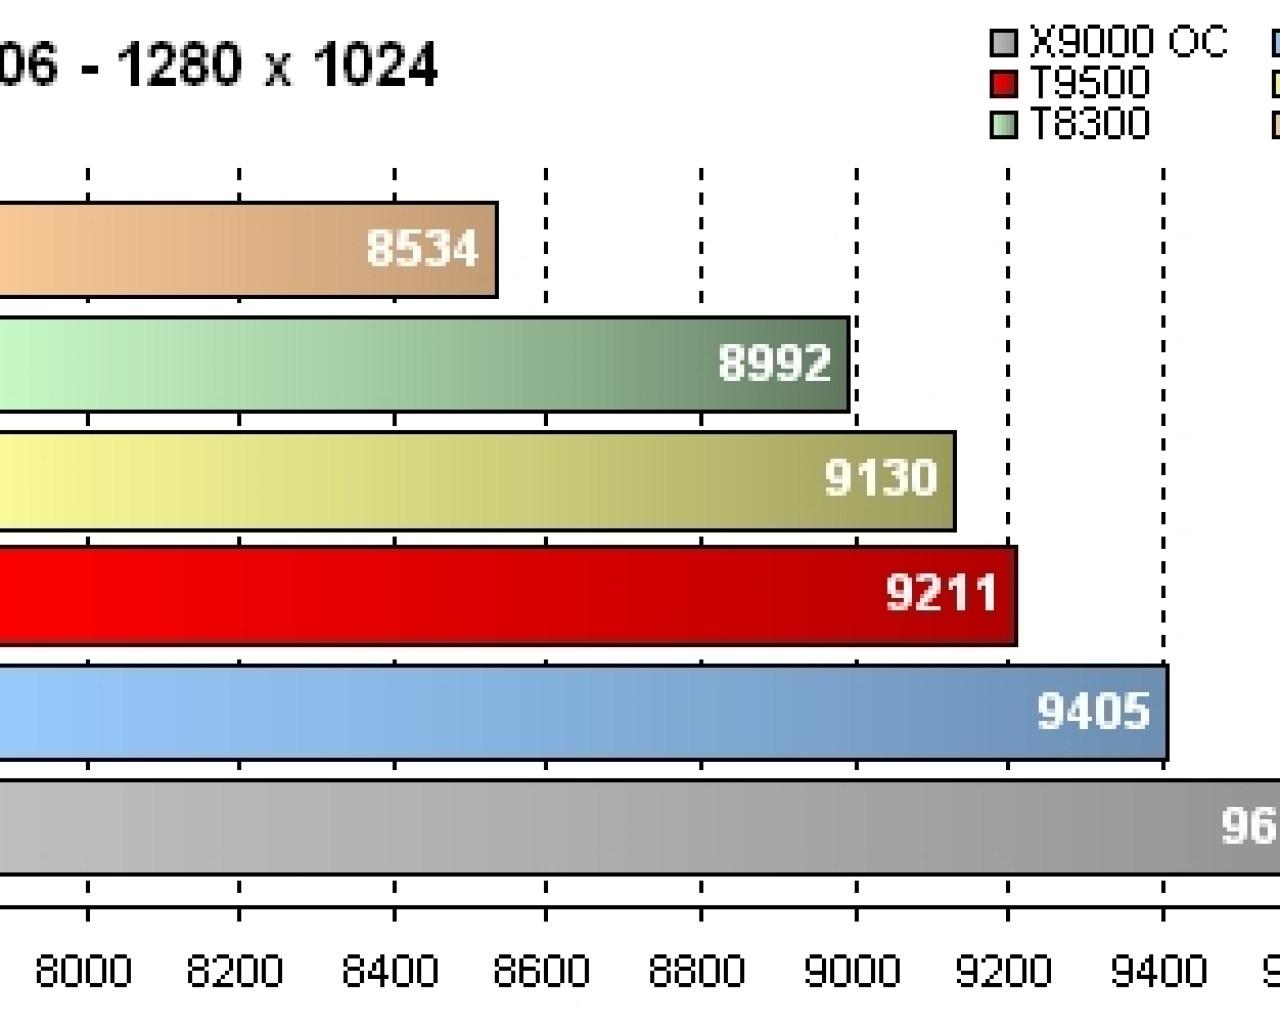 GeForce 8800M GTX - Résultats 3DMark06 Score - 1280 x 1024